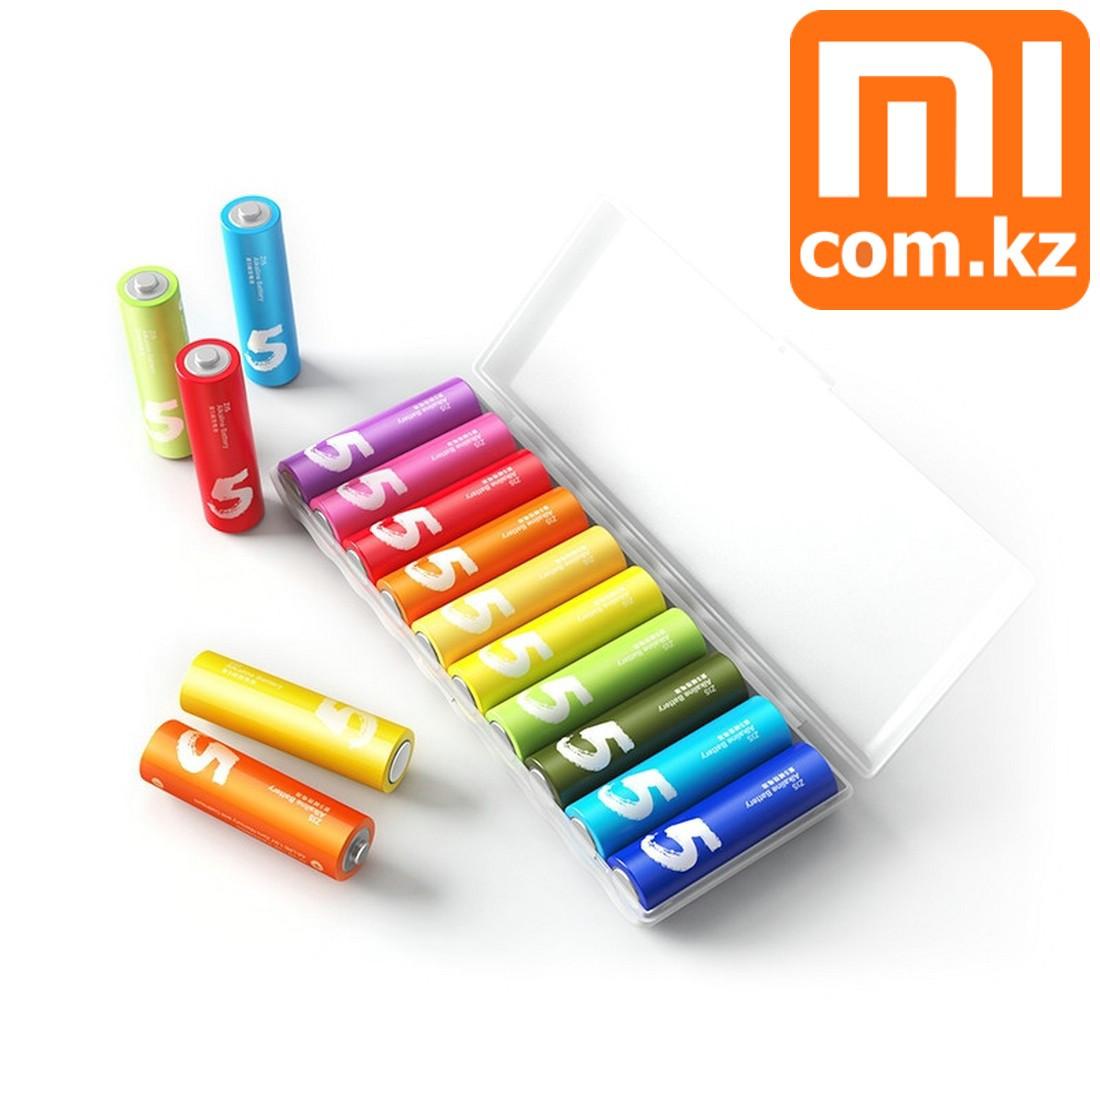 Батарейки Xiaomi Mi Rainbow AA, 10 шт, разноцветные. Оригинал.